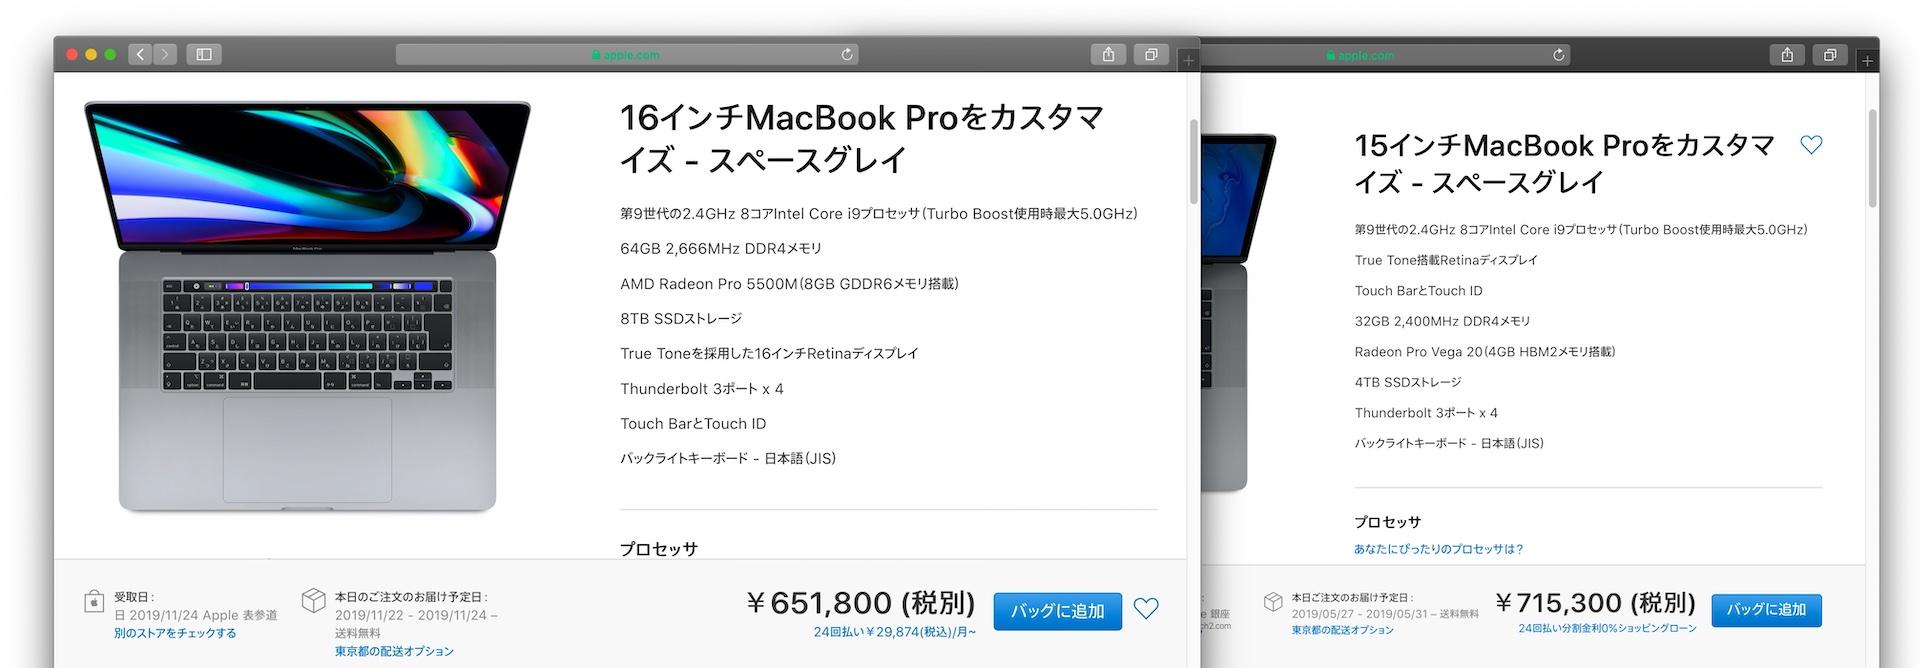 MacBook Pro (16-inch, 2019)のフルスペックモデルと価格